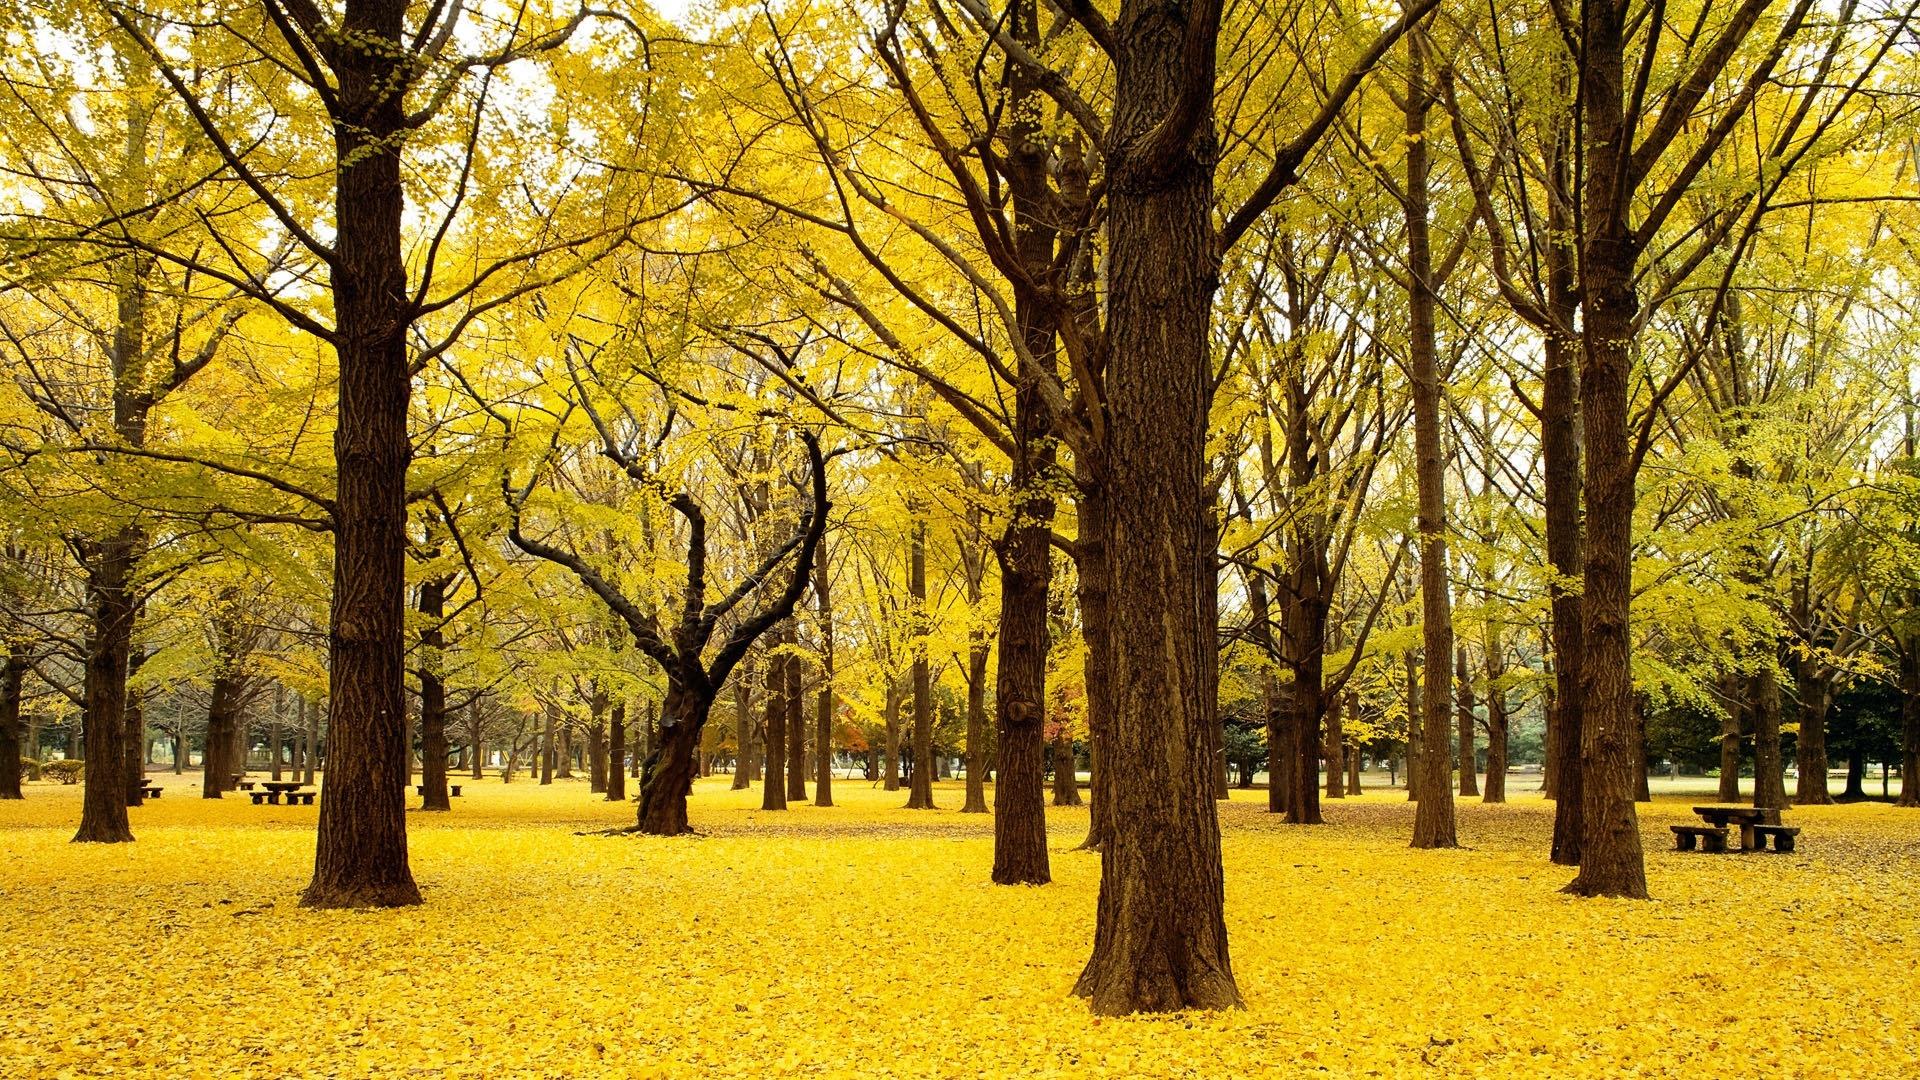 Yellow Nature computer wallpaper